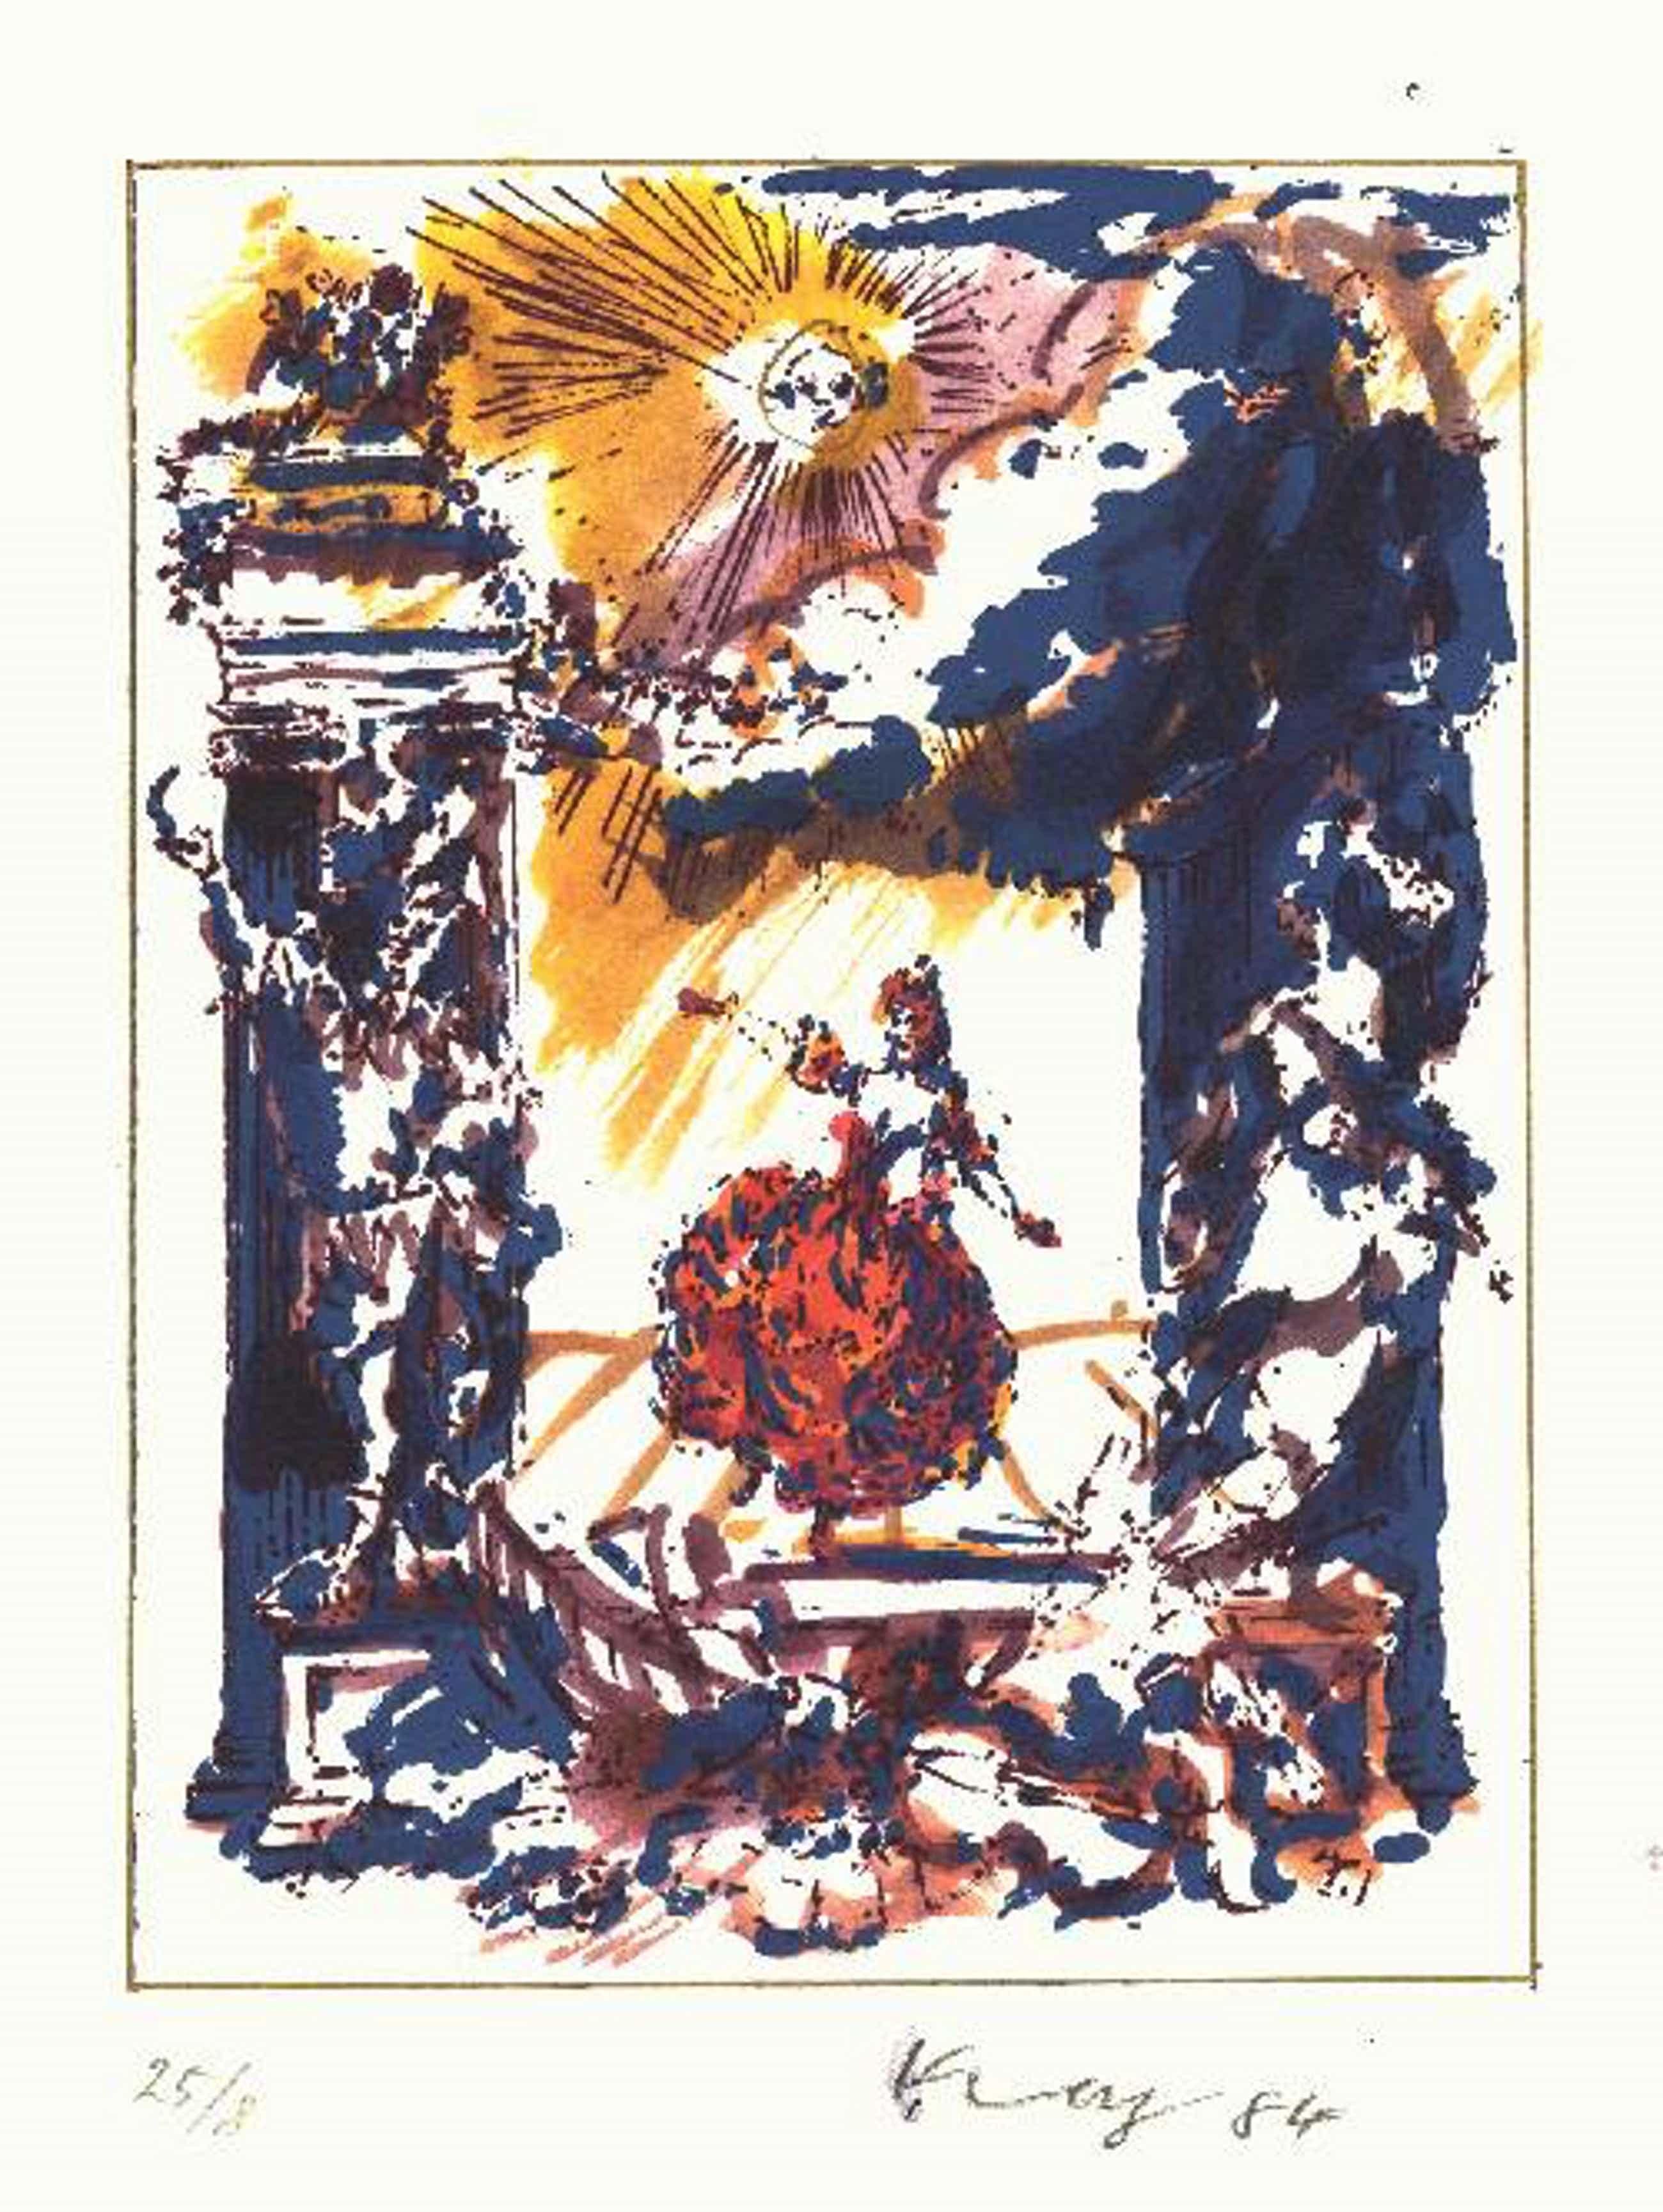 Helmut Koniarsky - Orig. Lithographie 1984, colloriert, signiert, datiert & nummeriert 25/8 kopen? Bied vanaf 30!